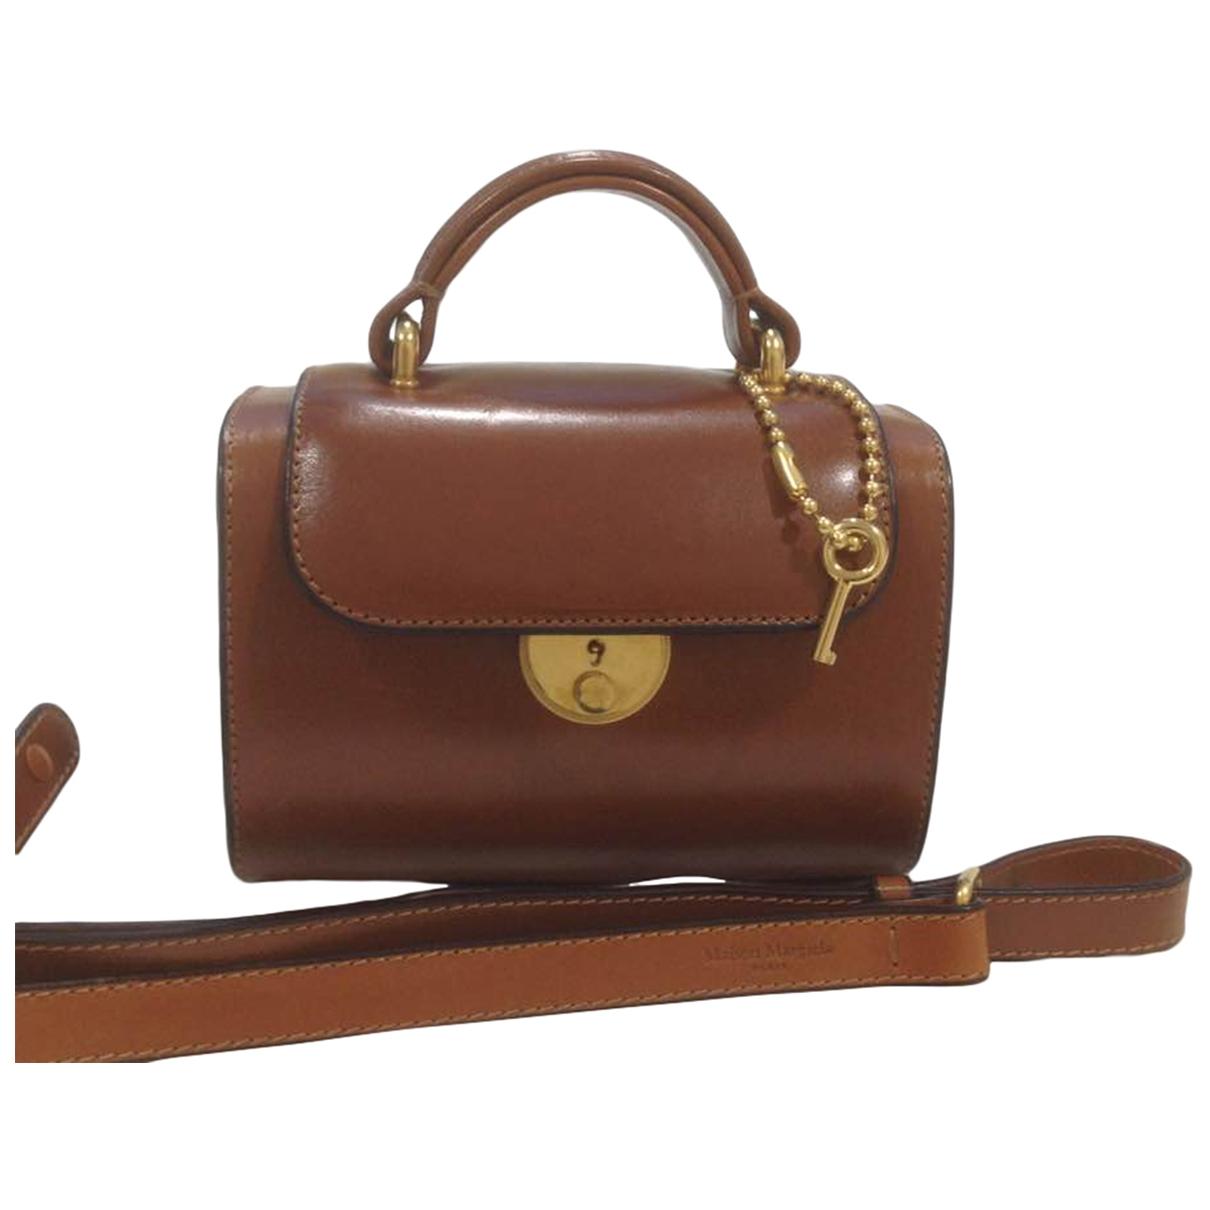 Maison Martin Margiela \N Brown Leather handbag for Women \N